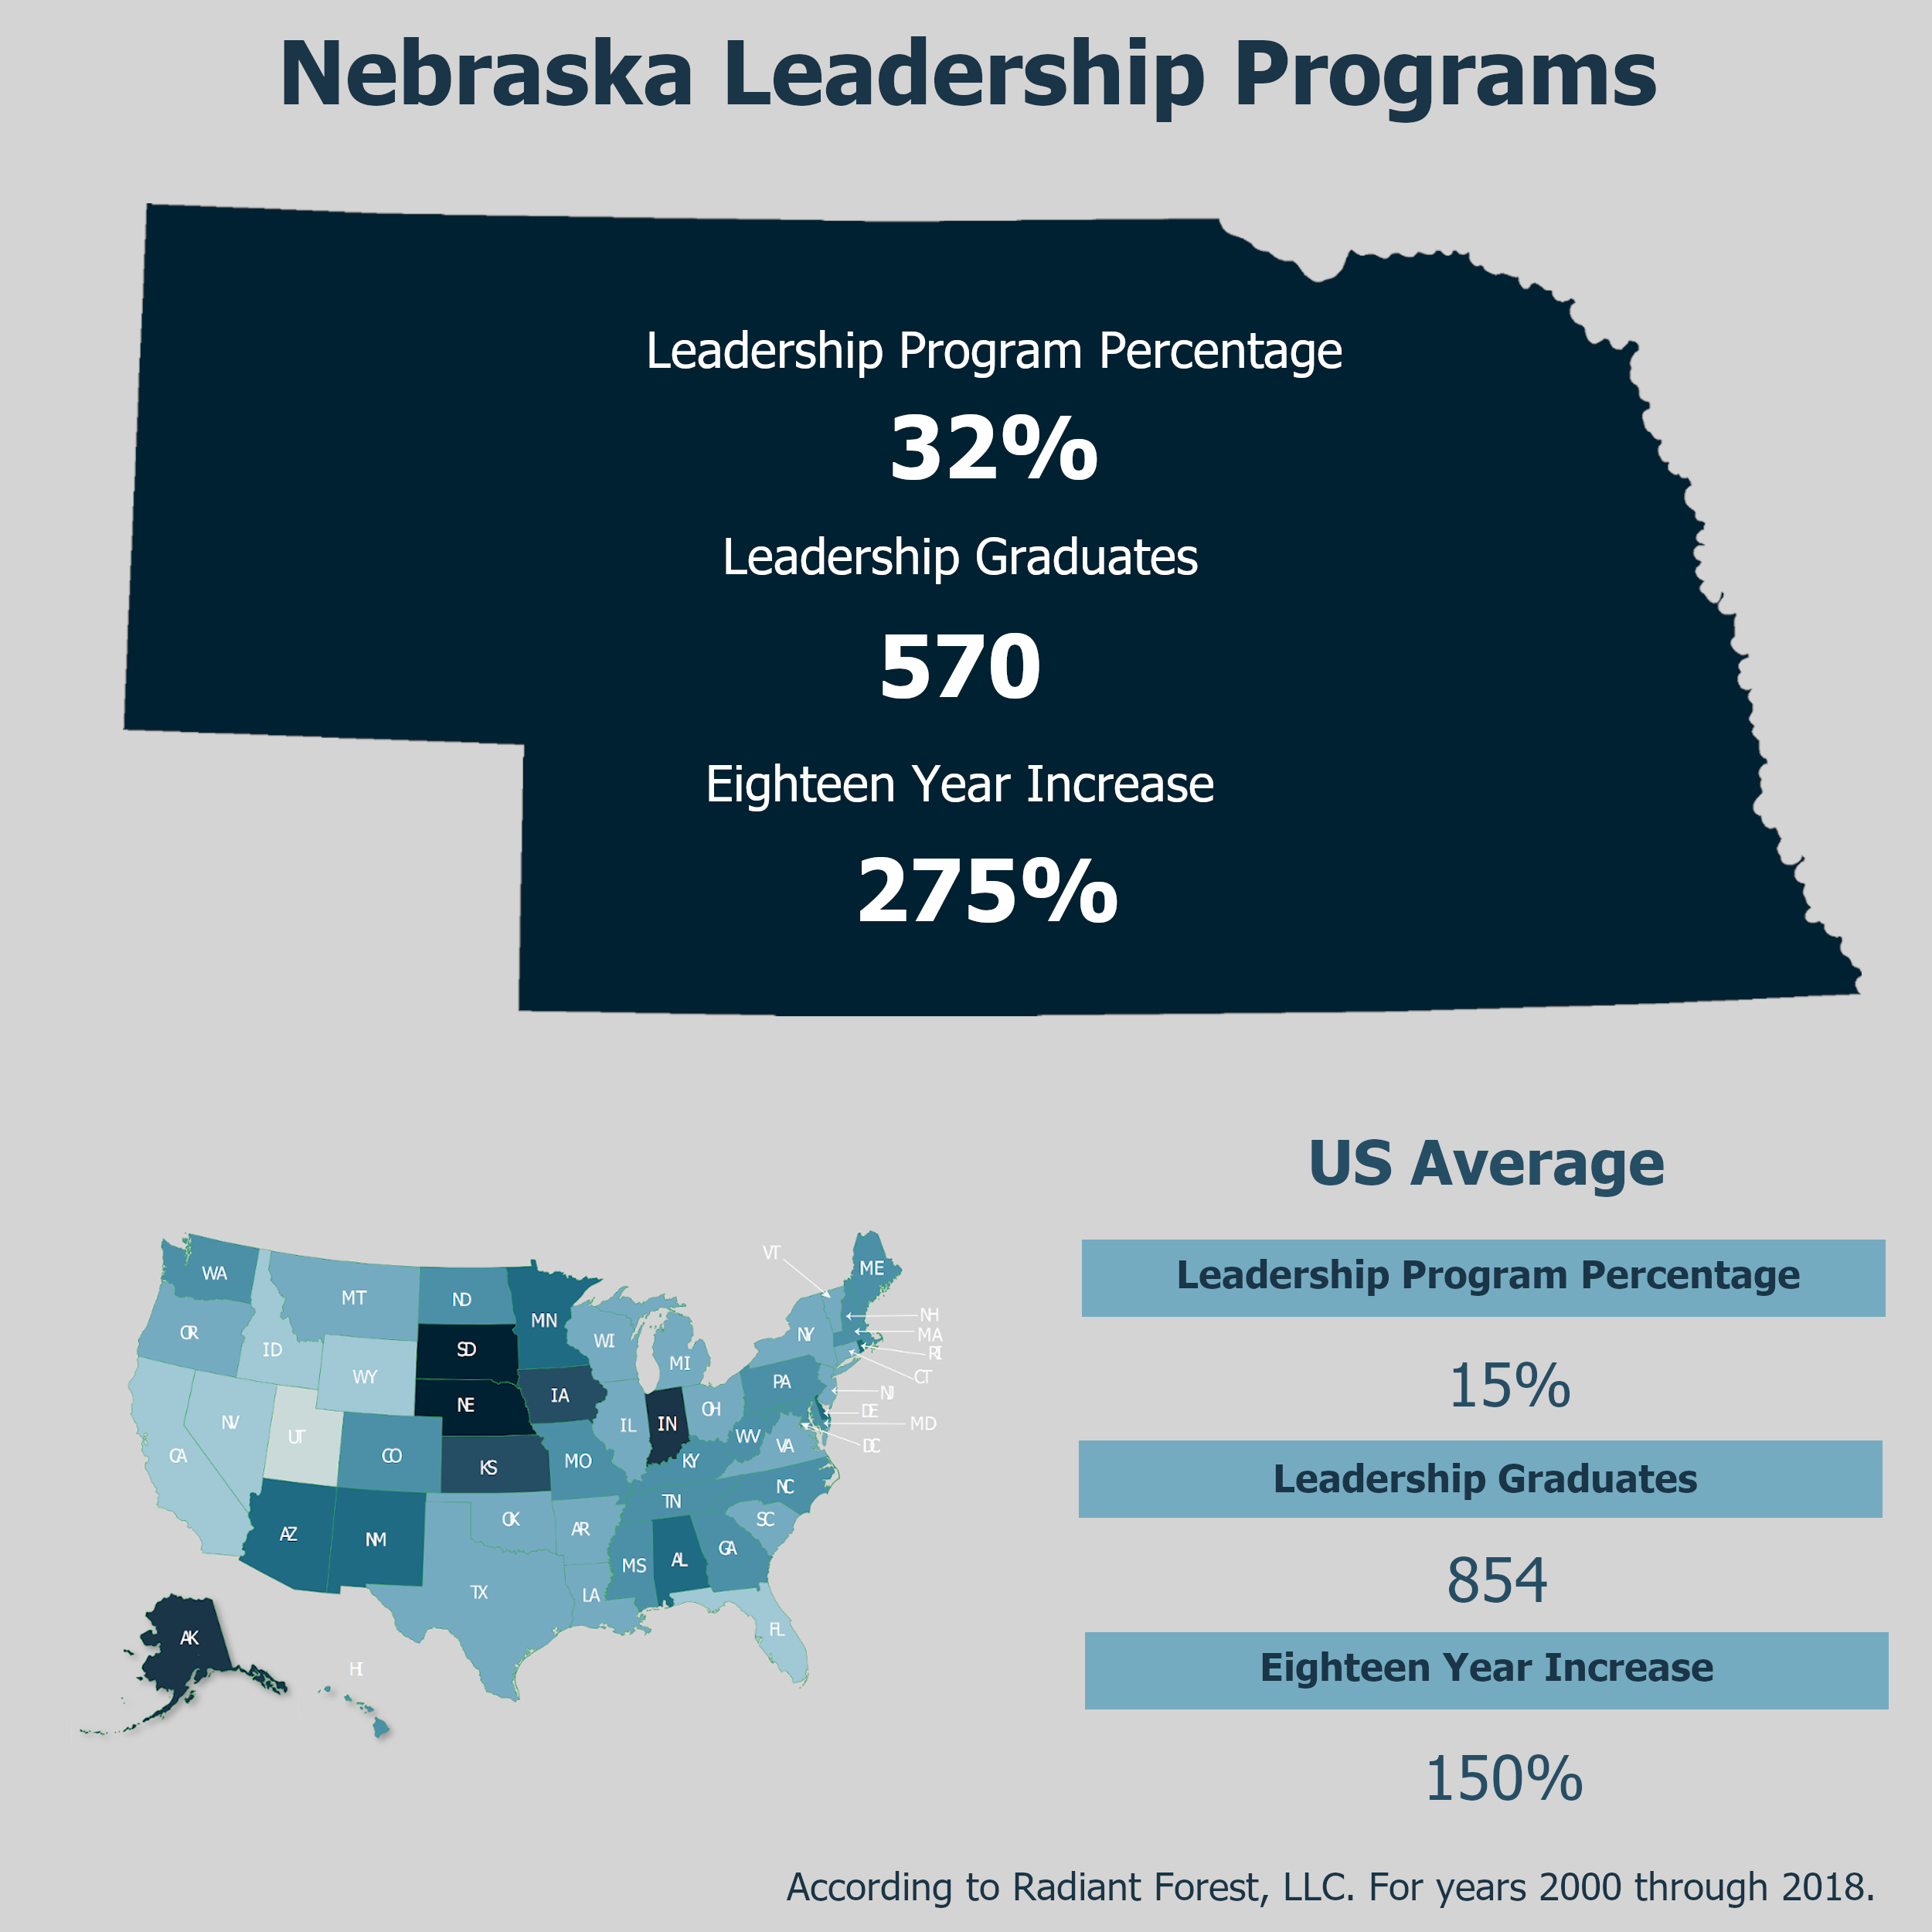 State Highlight of Nebraska Leadership Programs in Postsecondary Institutions